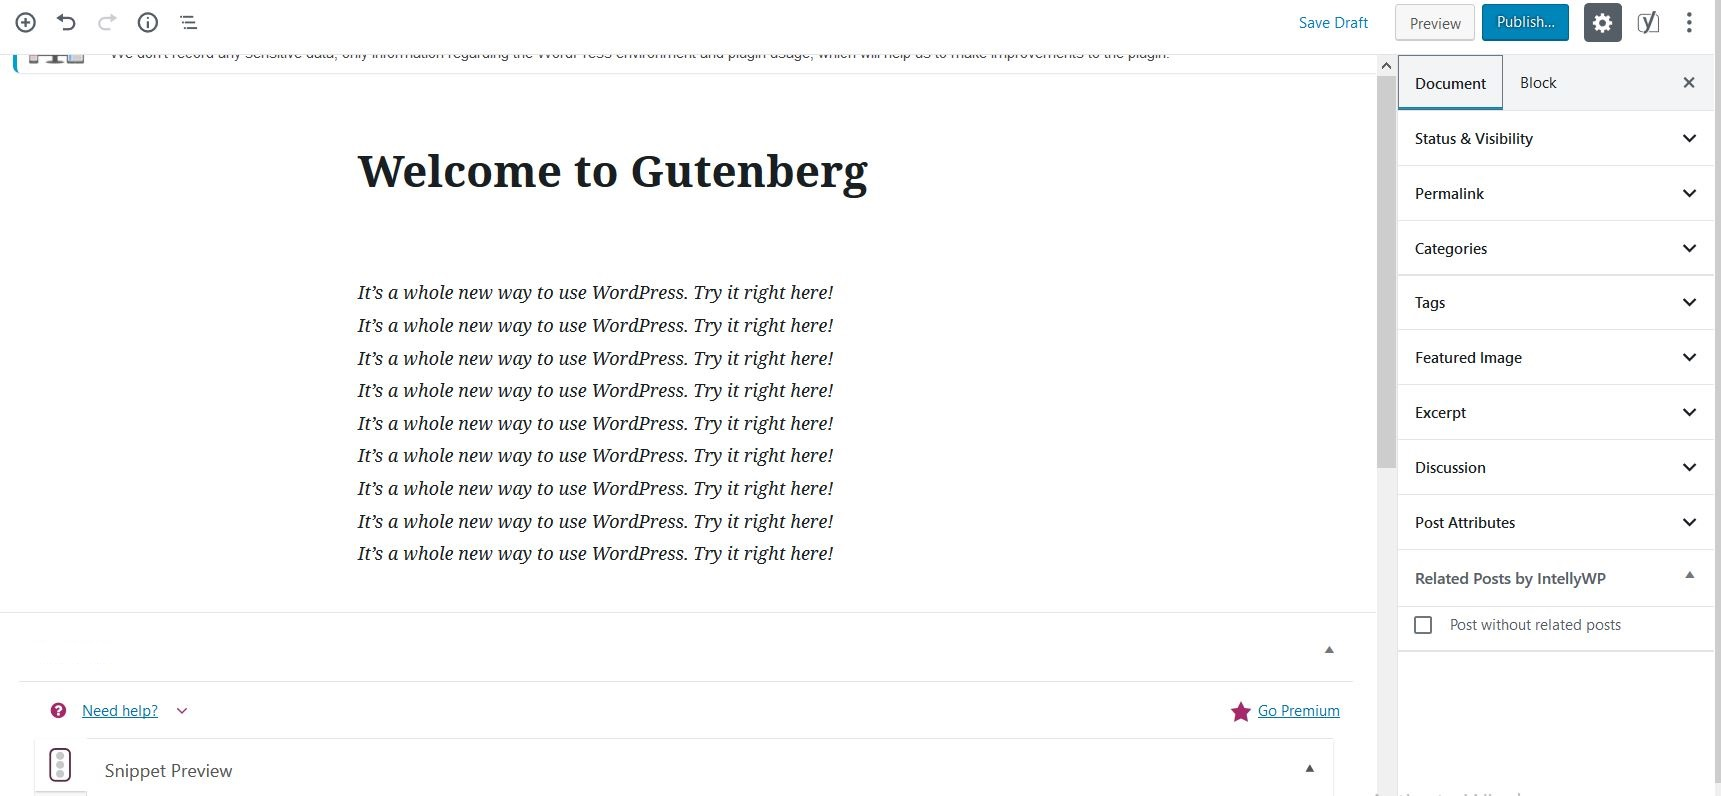 A detailed Overview of WordPress 5.0 Gutenberg Update, errors, SEO effects